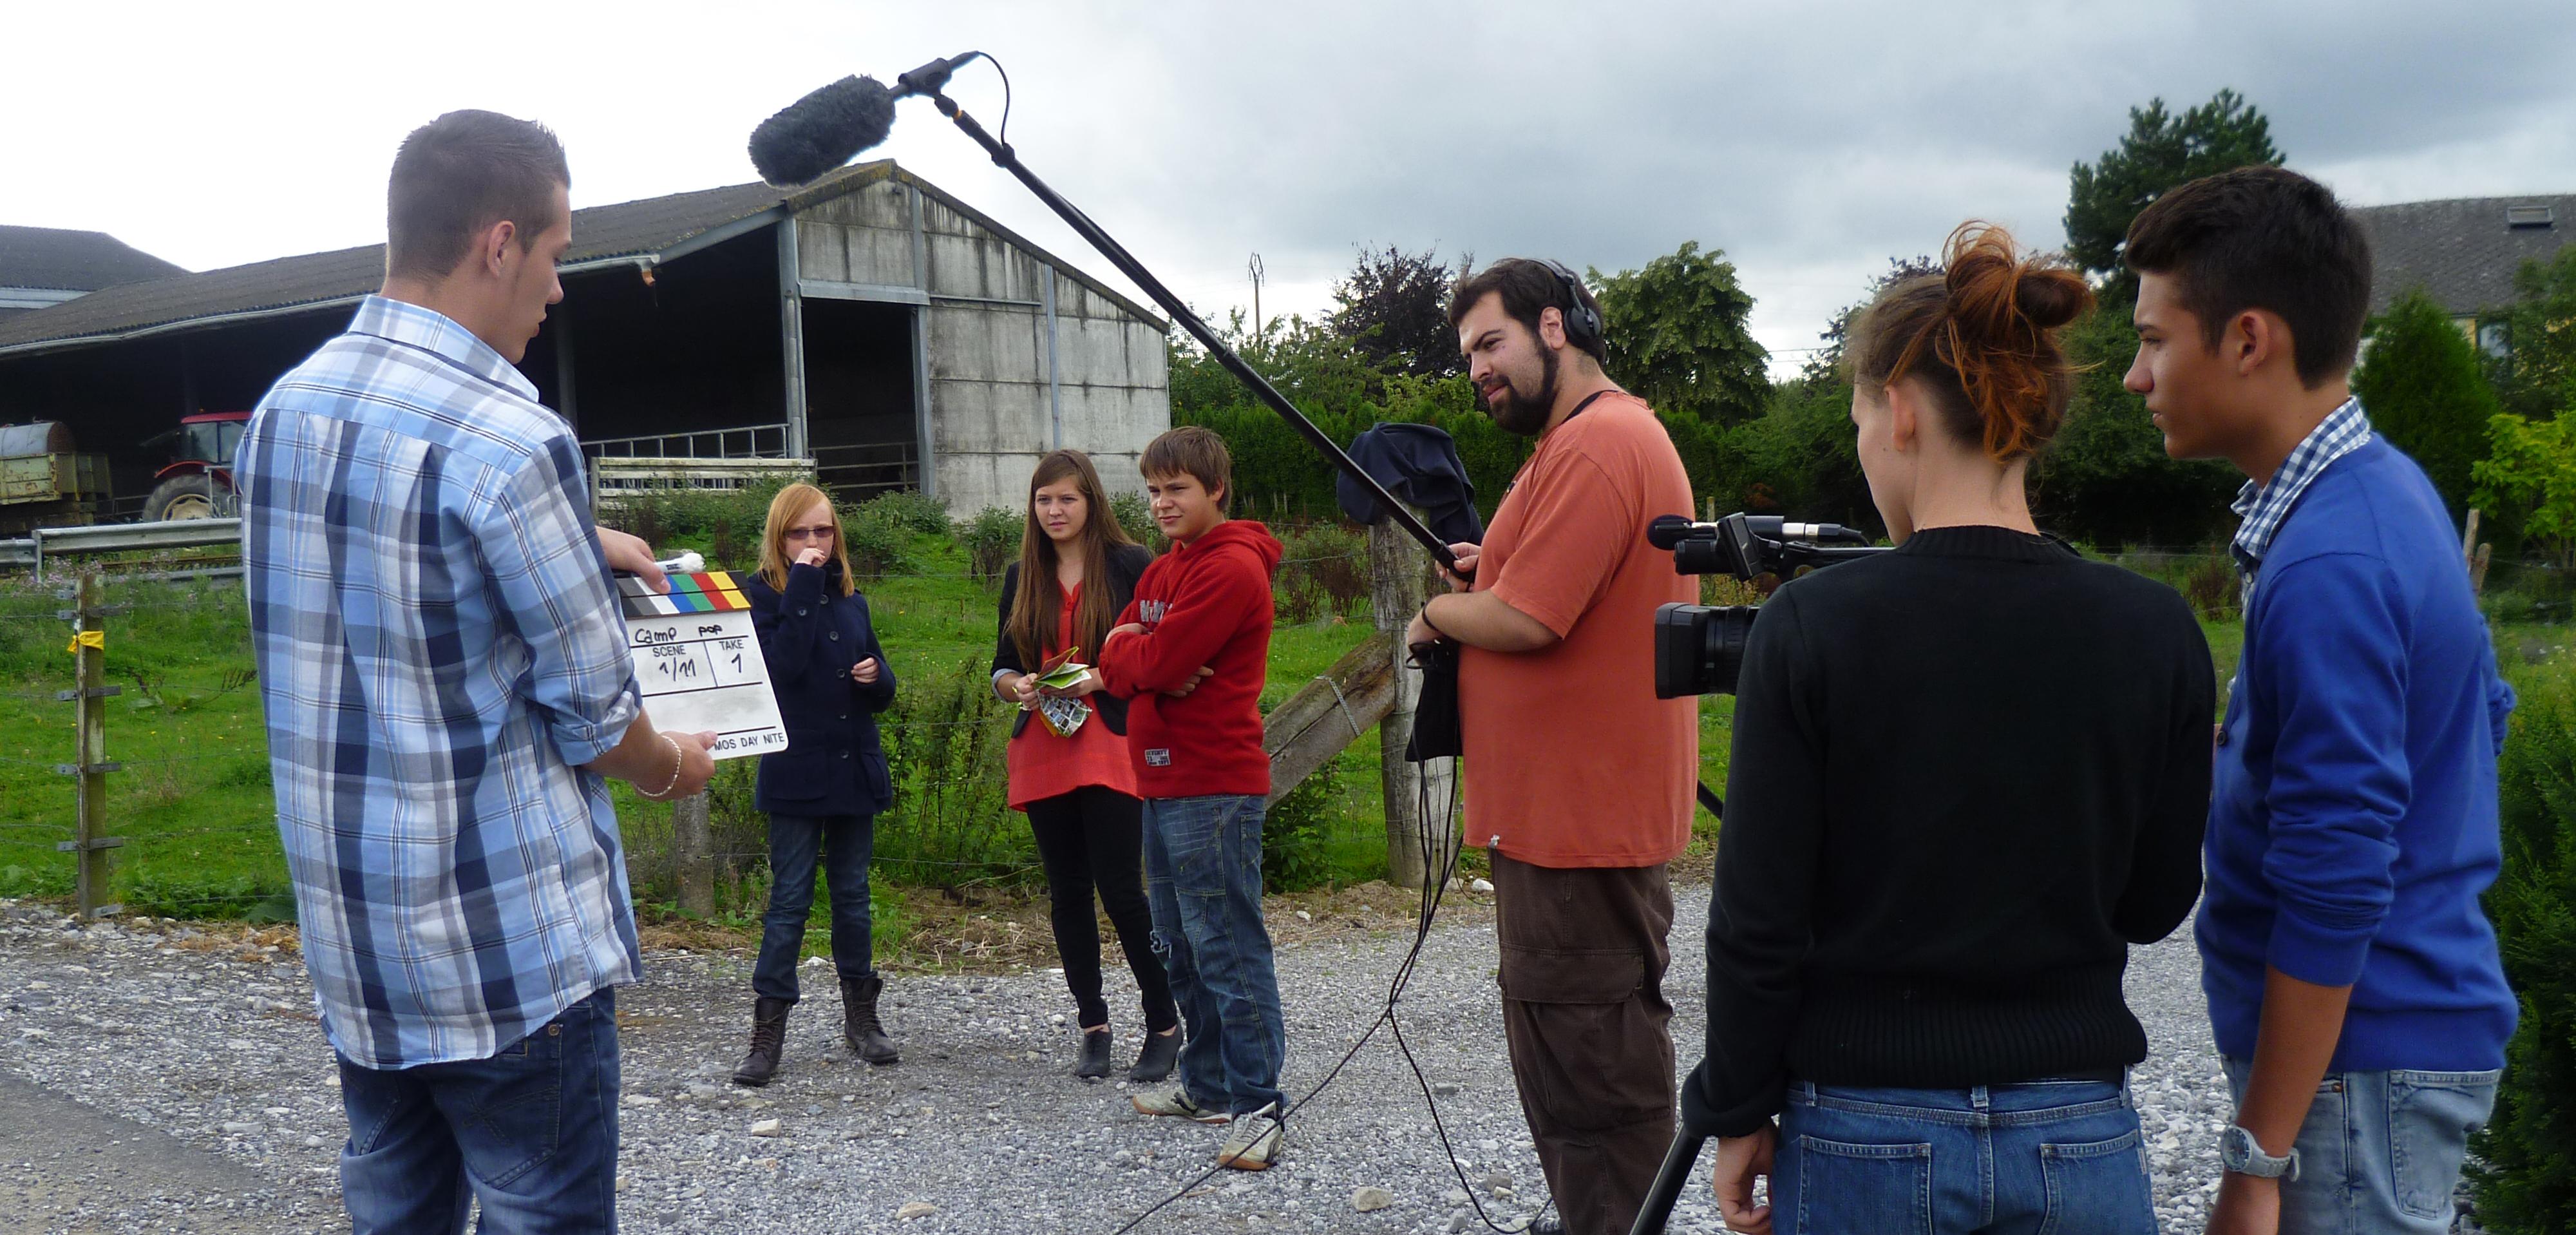 tournage camp